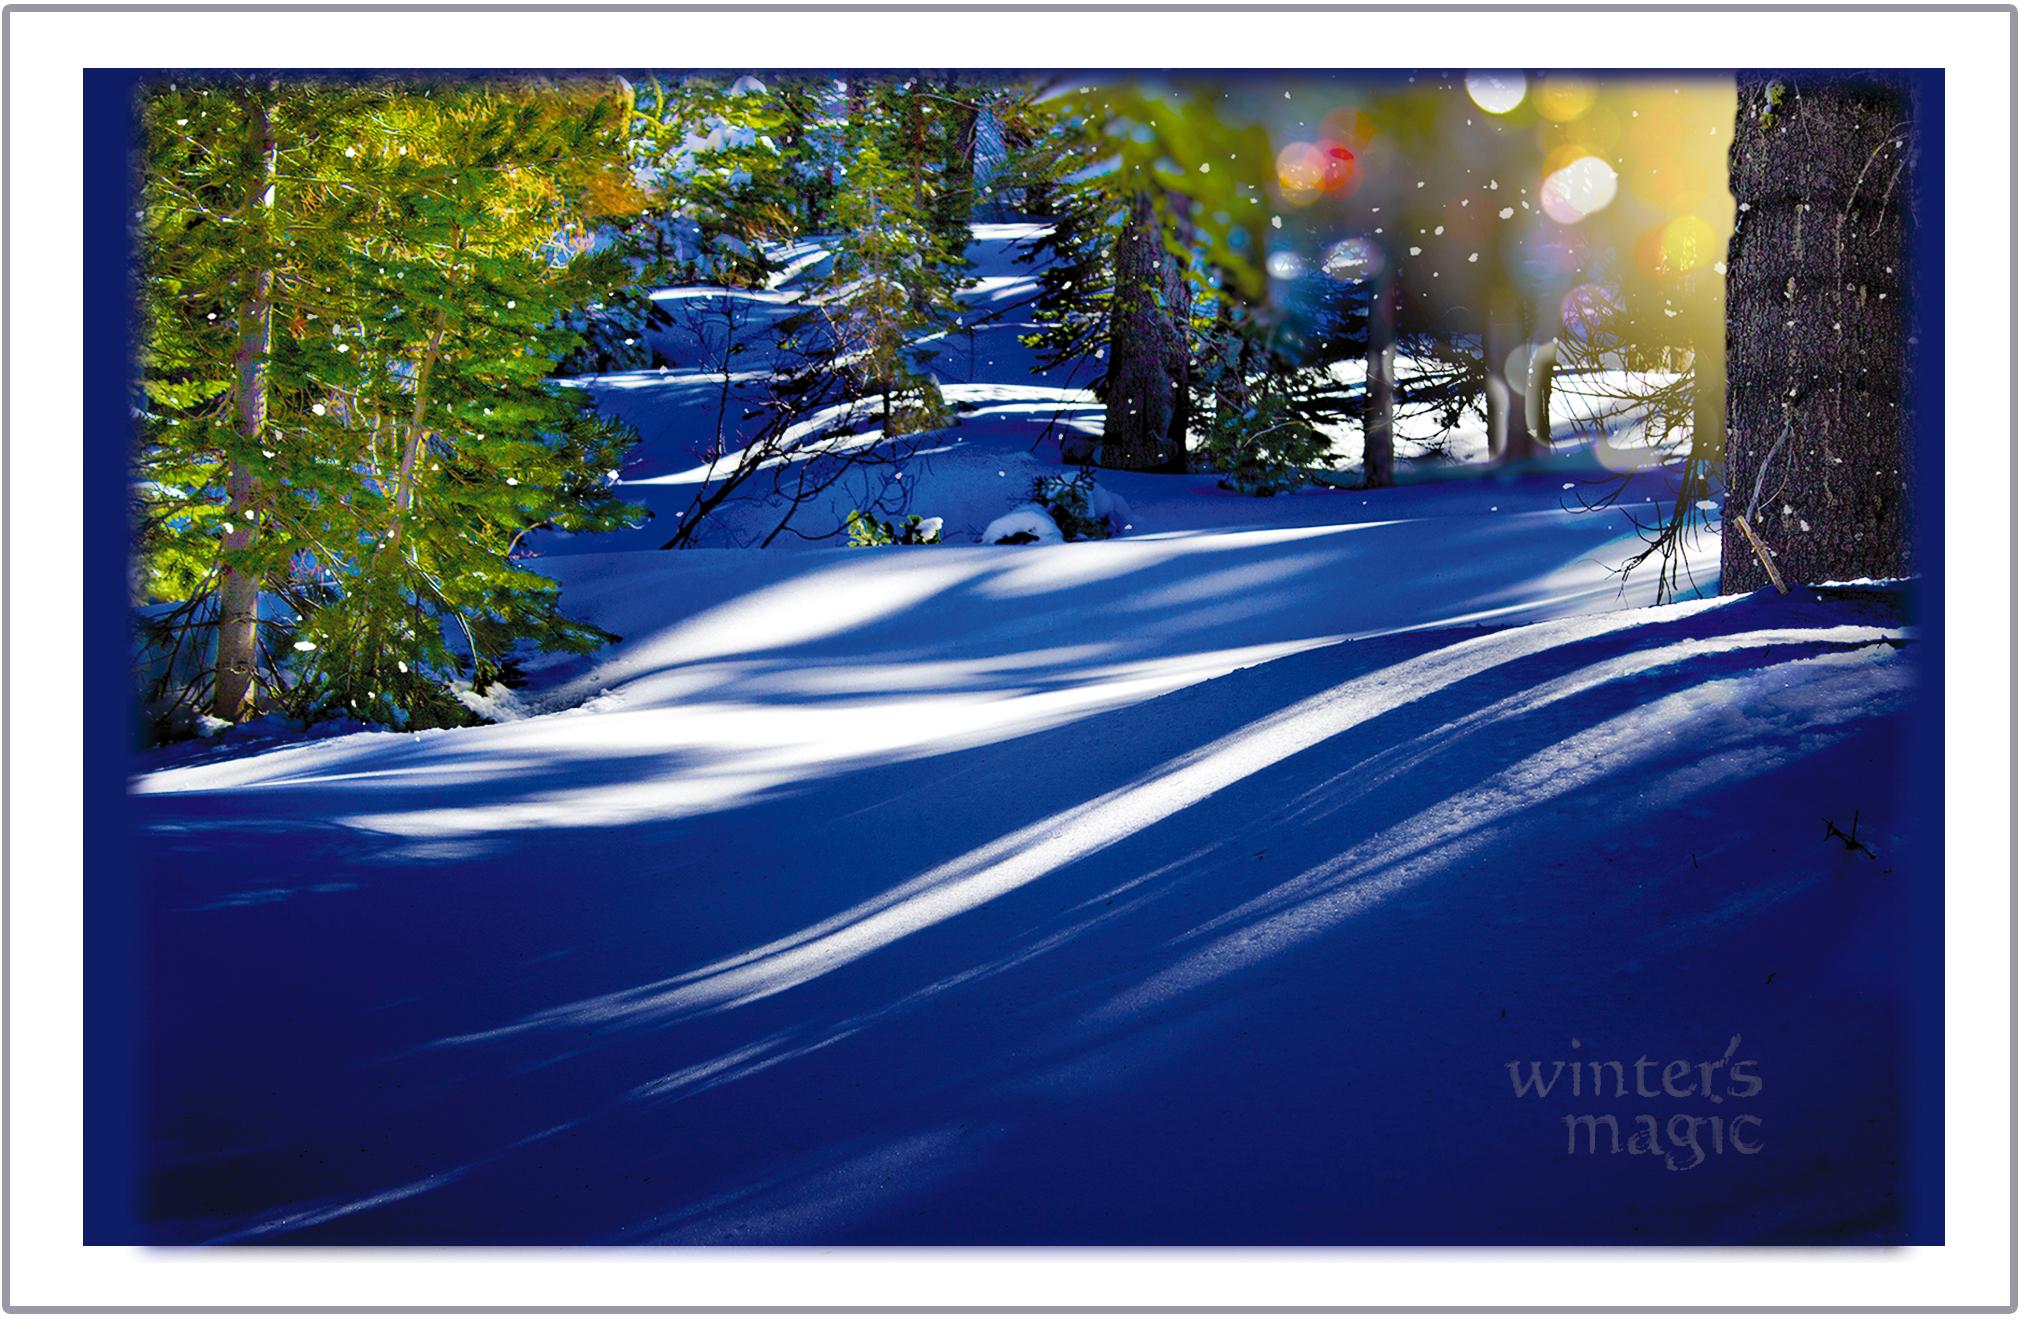 Winter's Magic greeting card